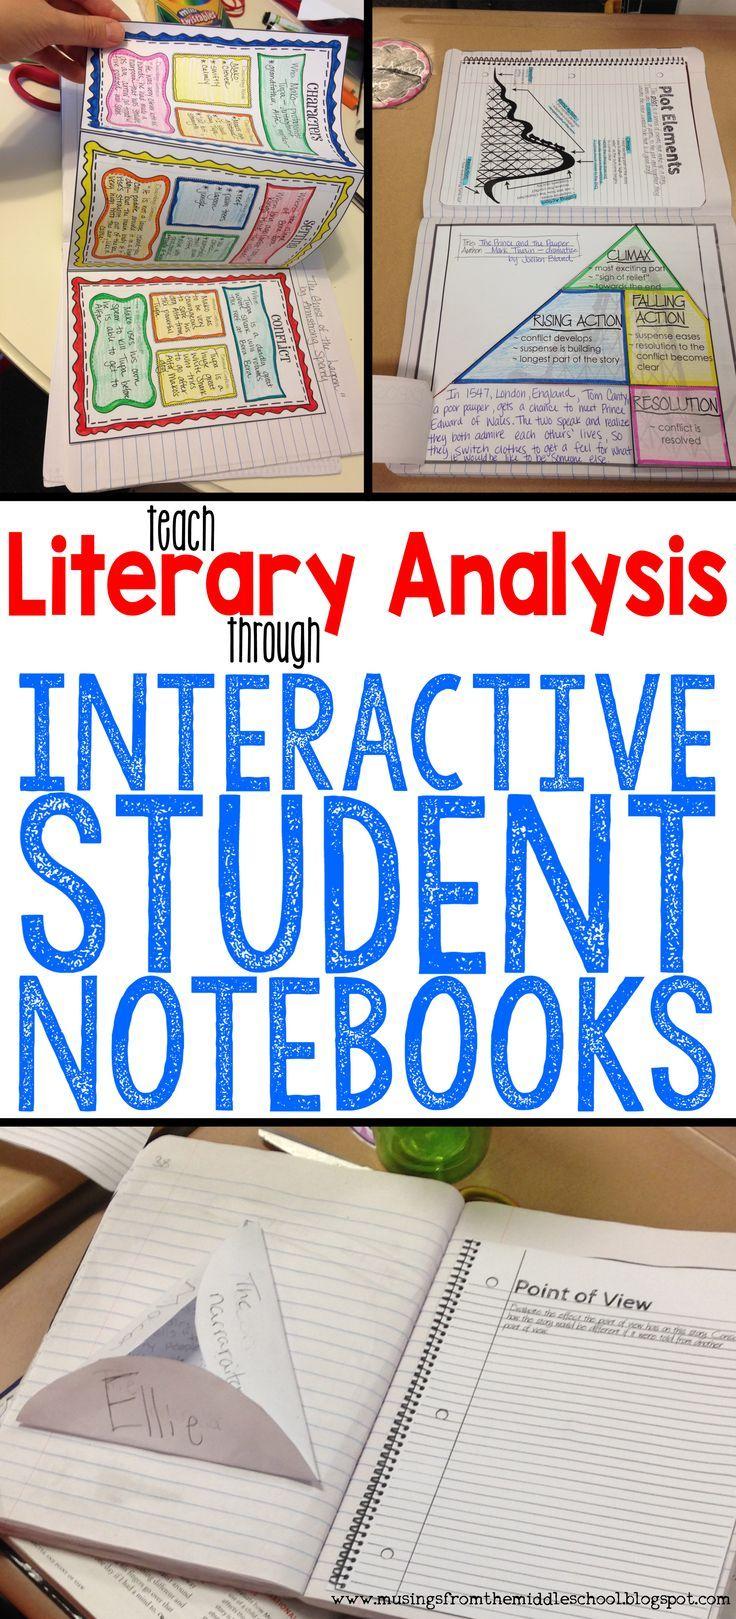 schools of literary criticism pdf